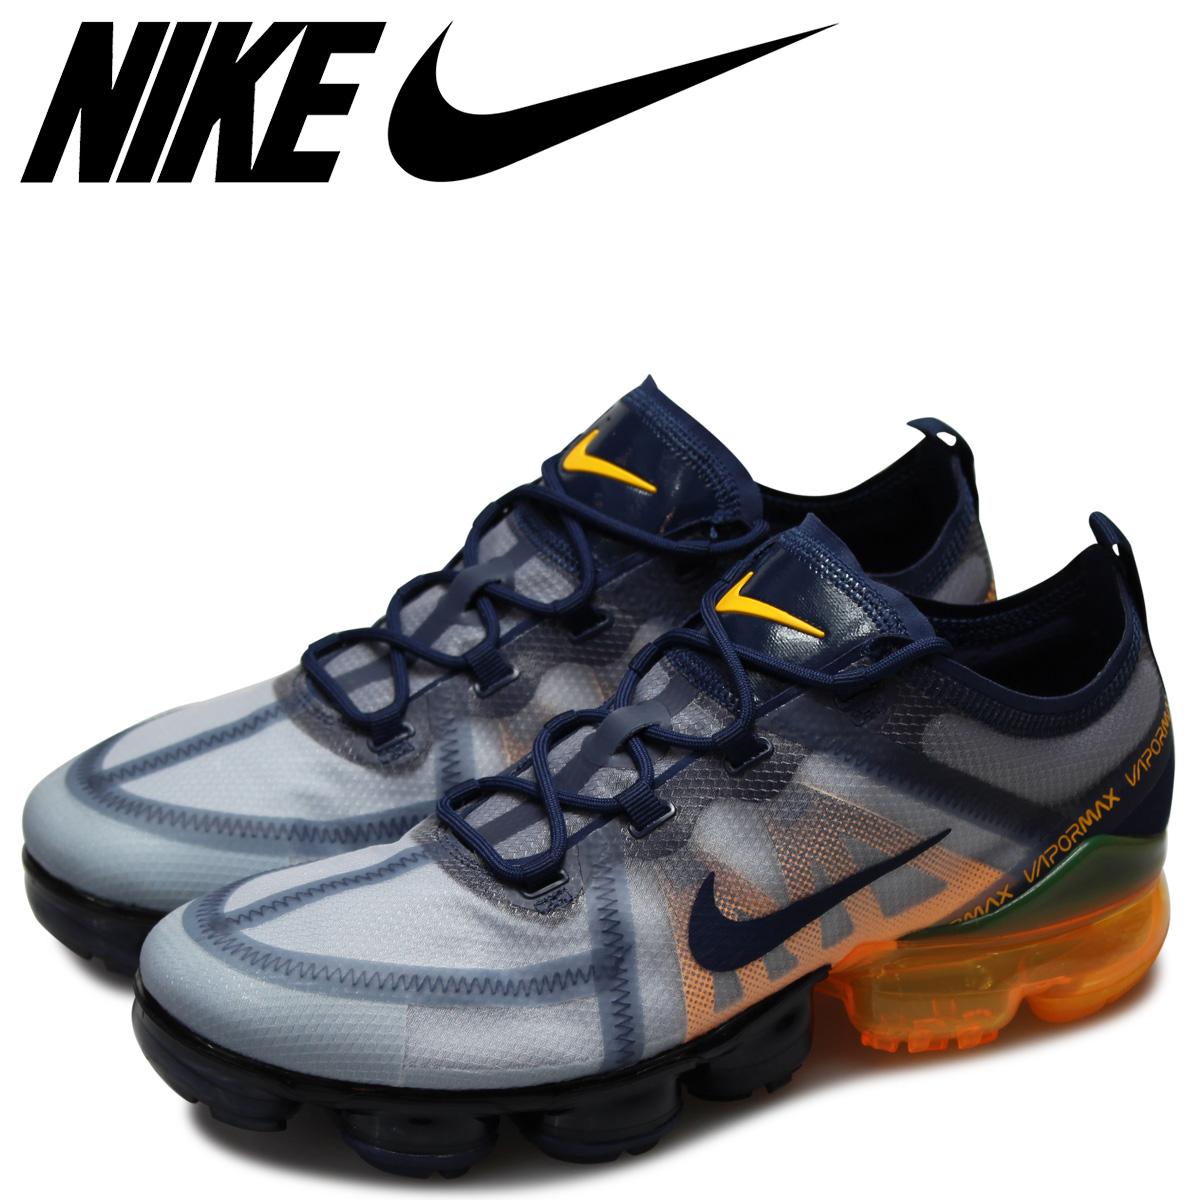 lowest price 68b42 b8cb6 NIKE Nike air vapor max 2019 sneakers men AIR VAPORMAX 2019 navy AR6631-401